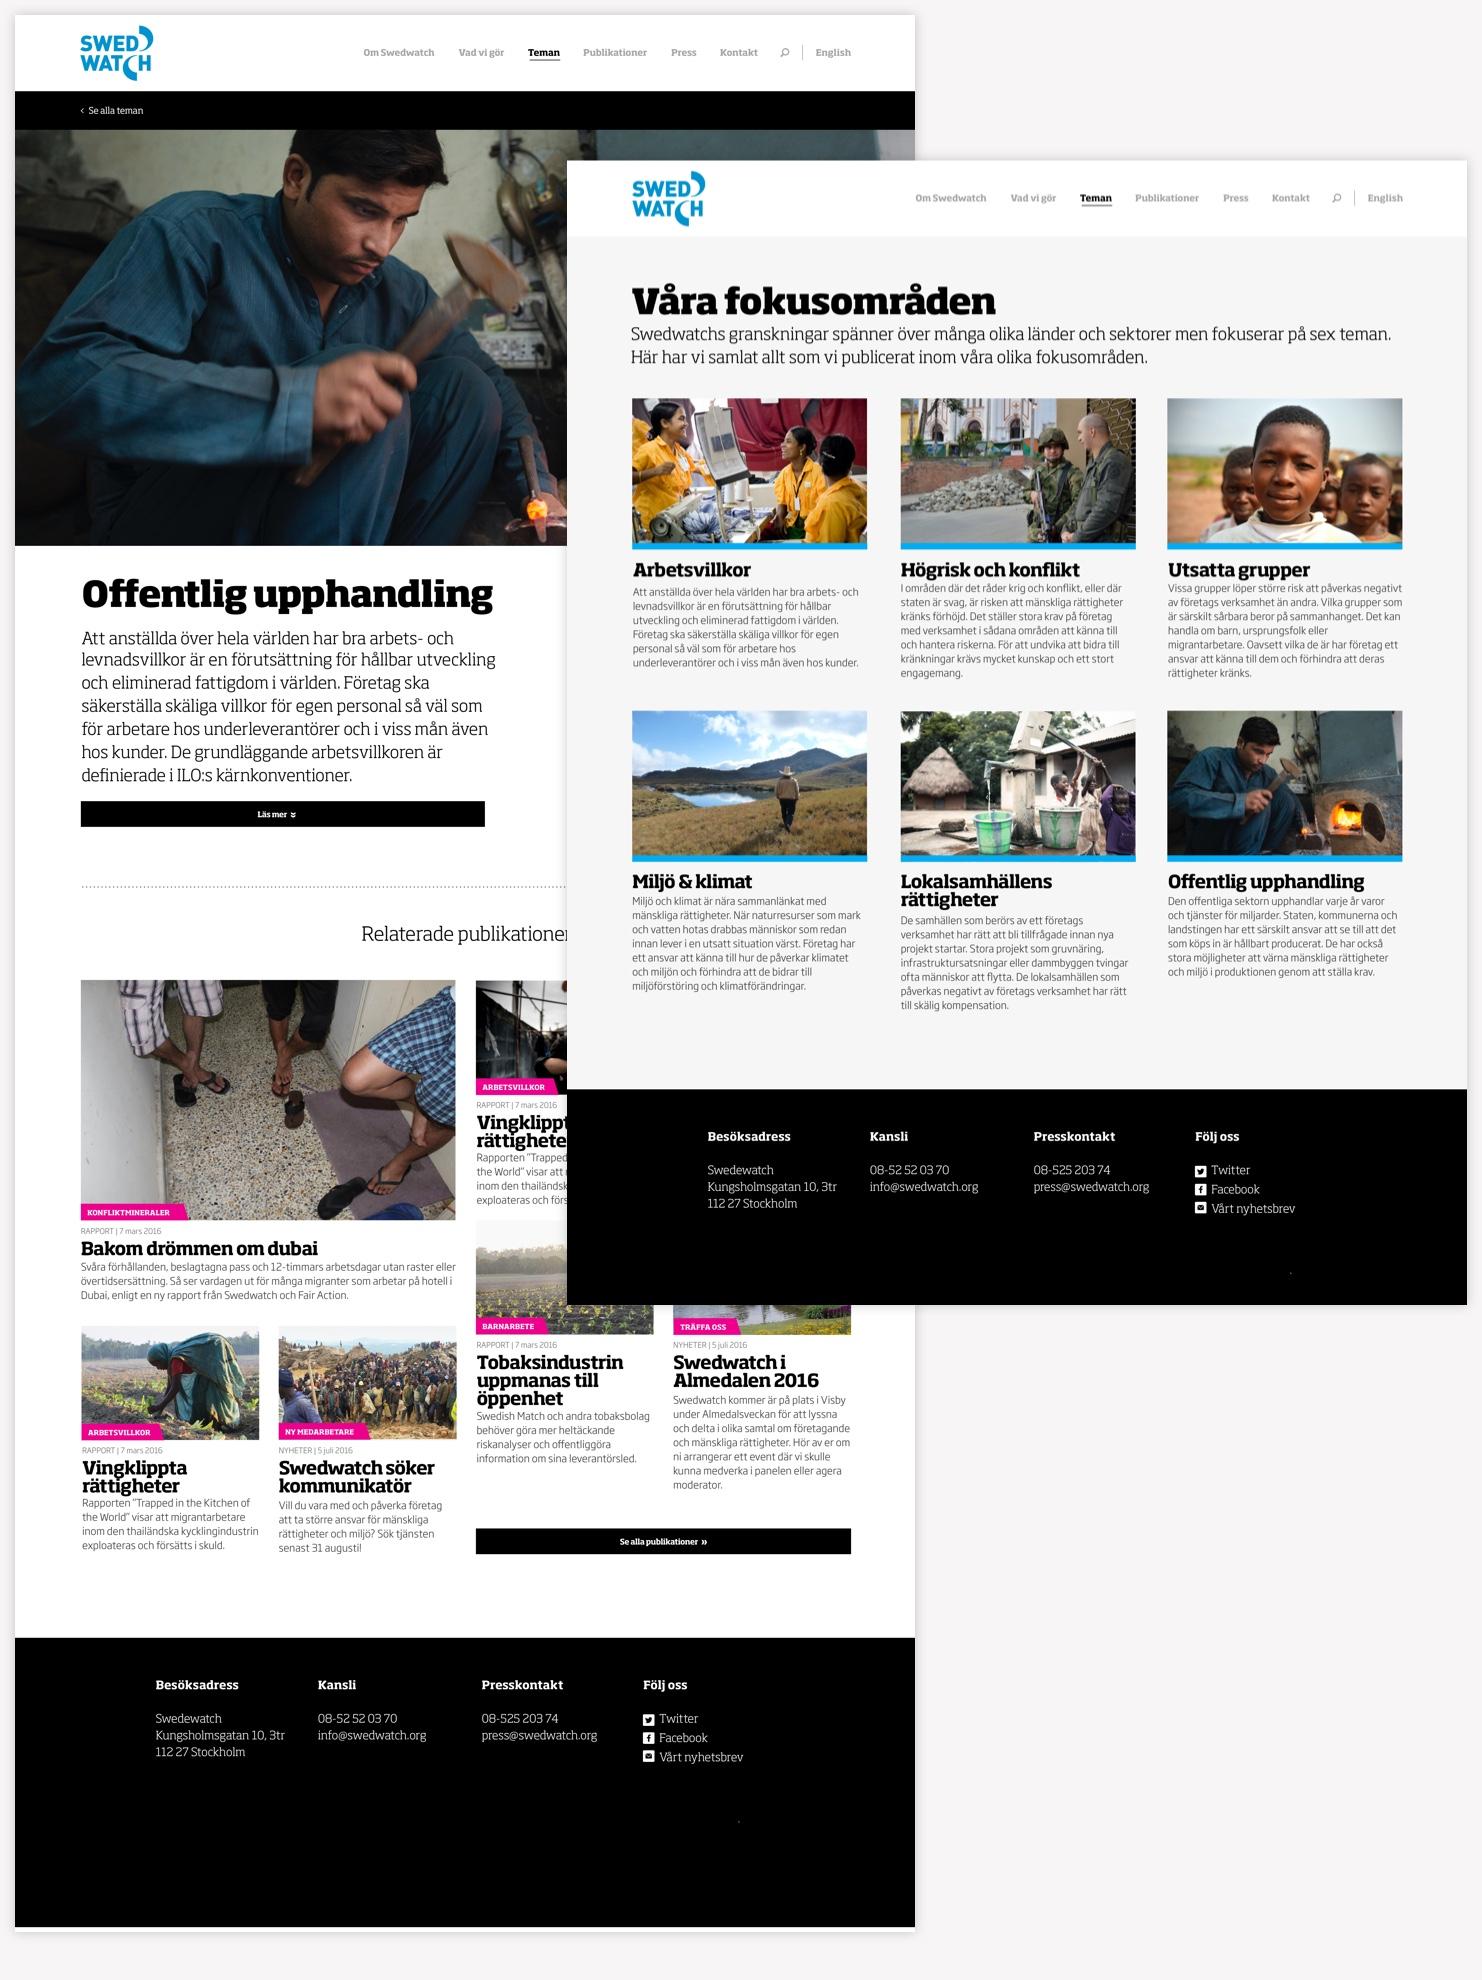 Swedwatch design fokusområden